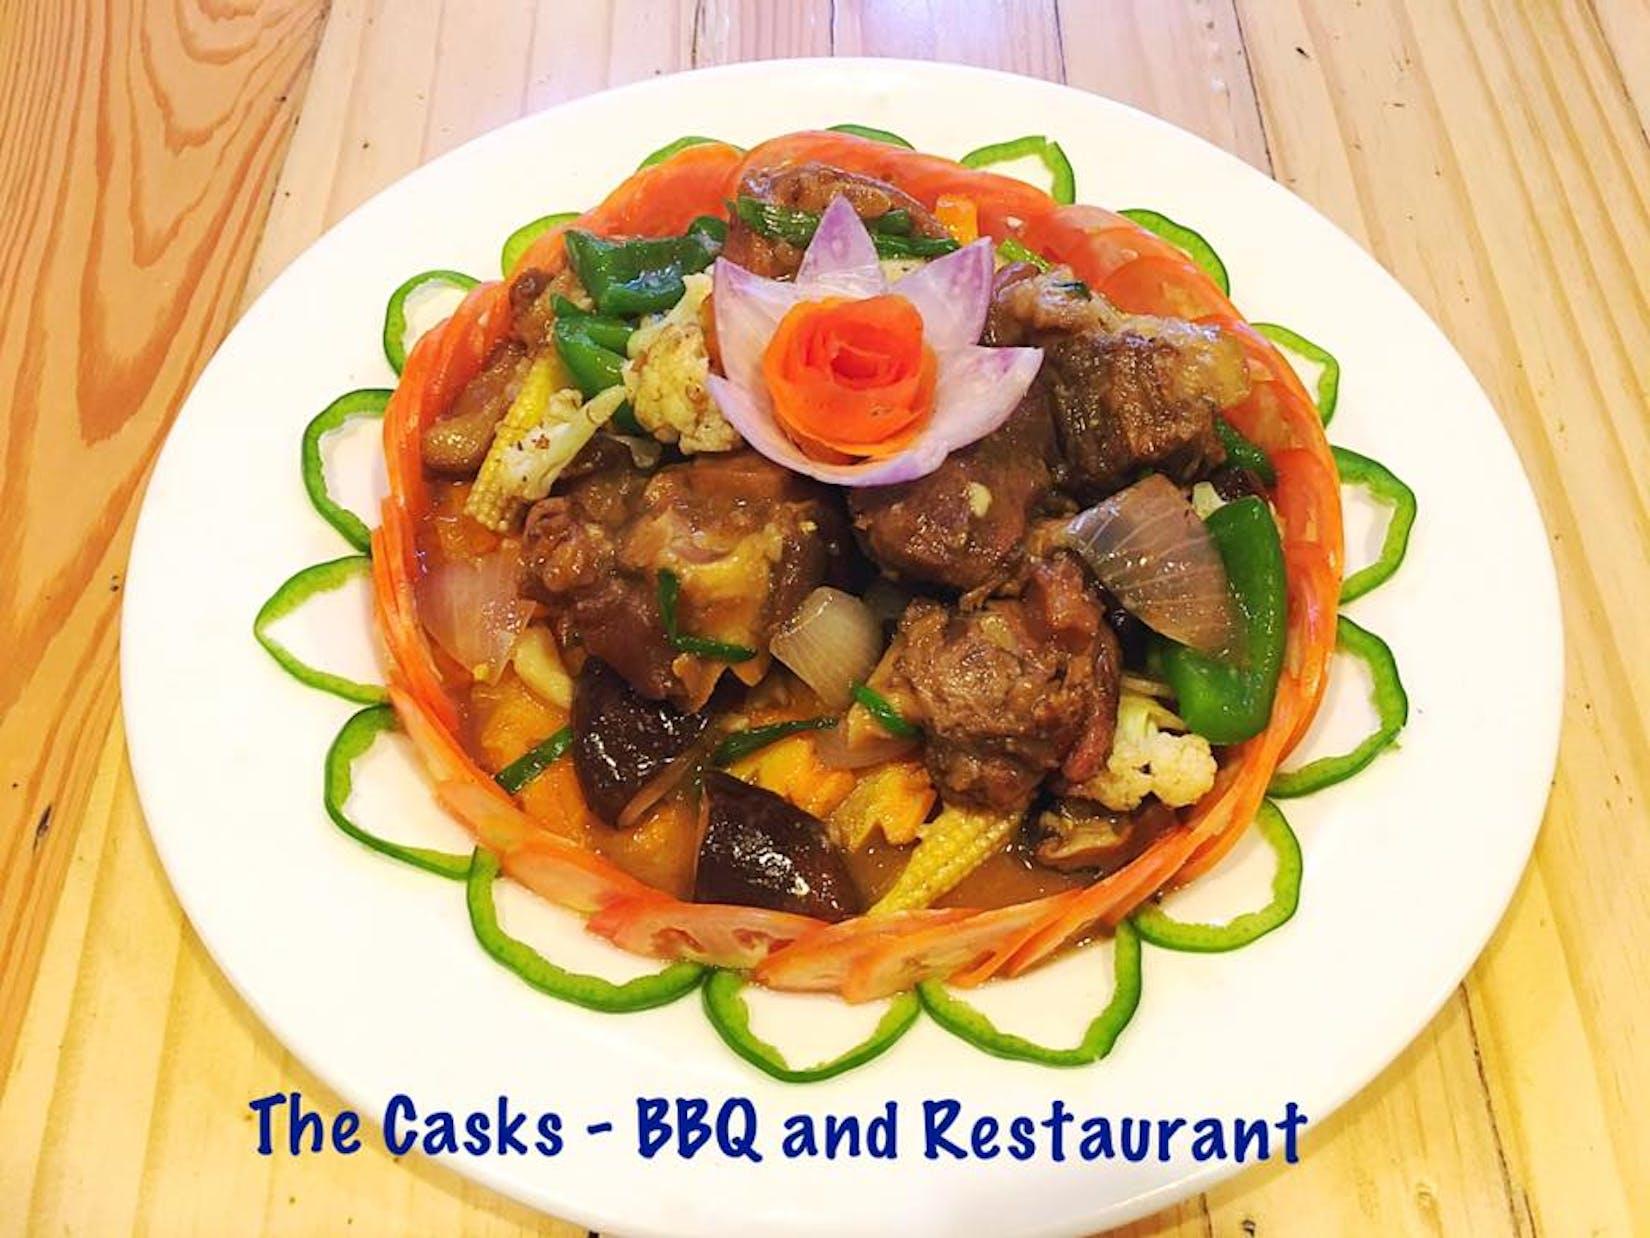 The Casks - B.B.Q, Bar and Restaurant | yathar